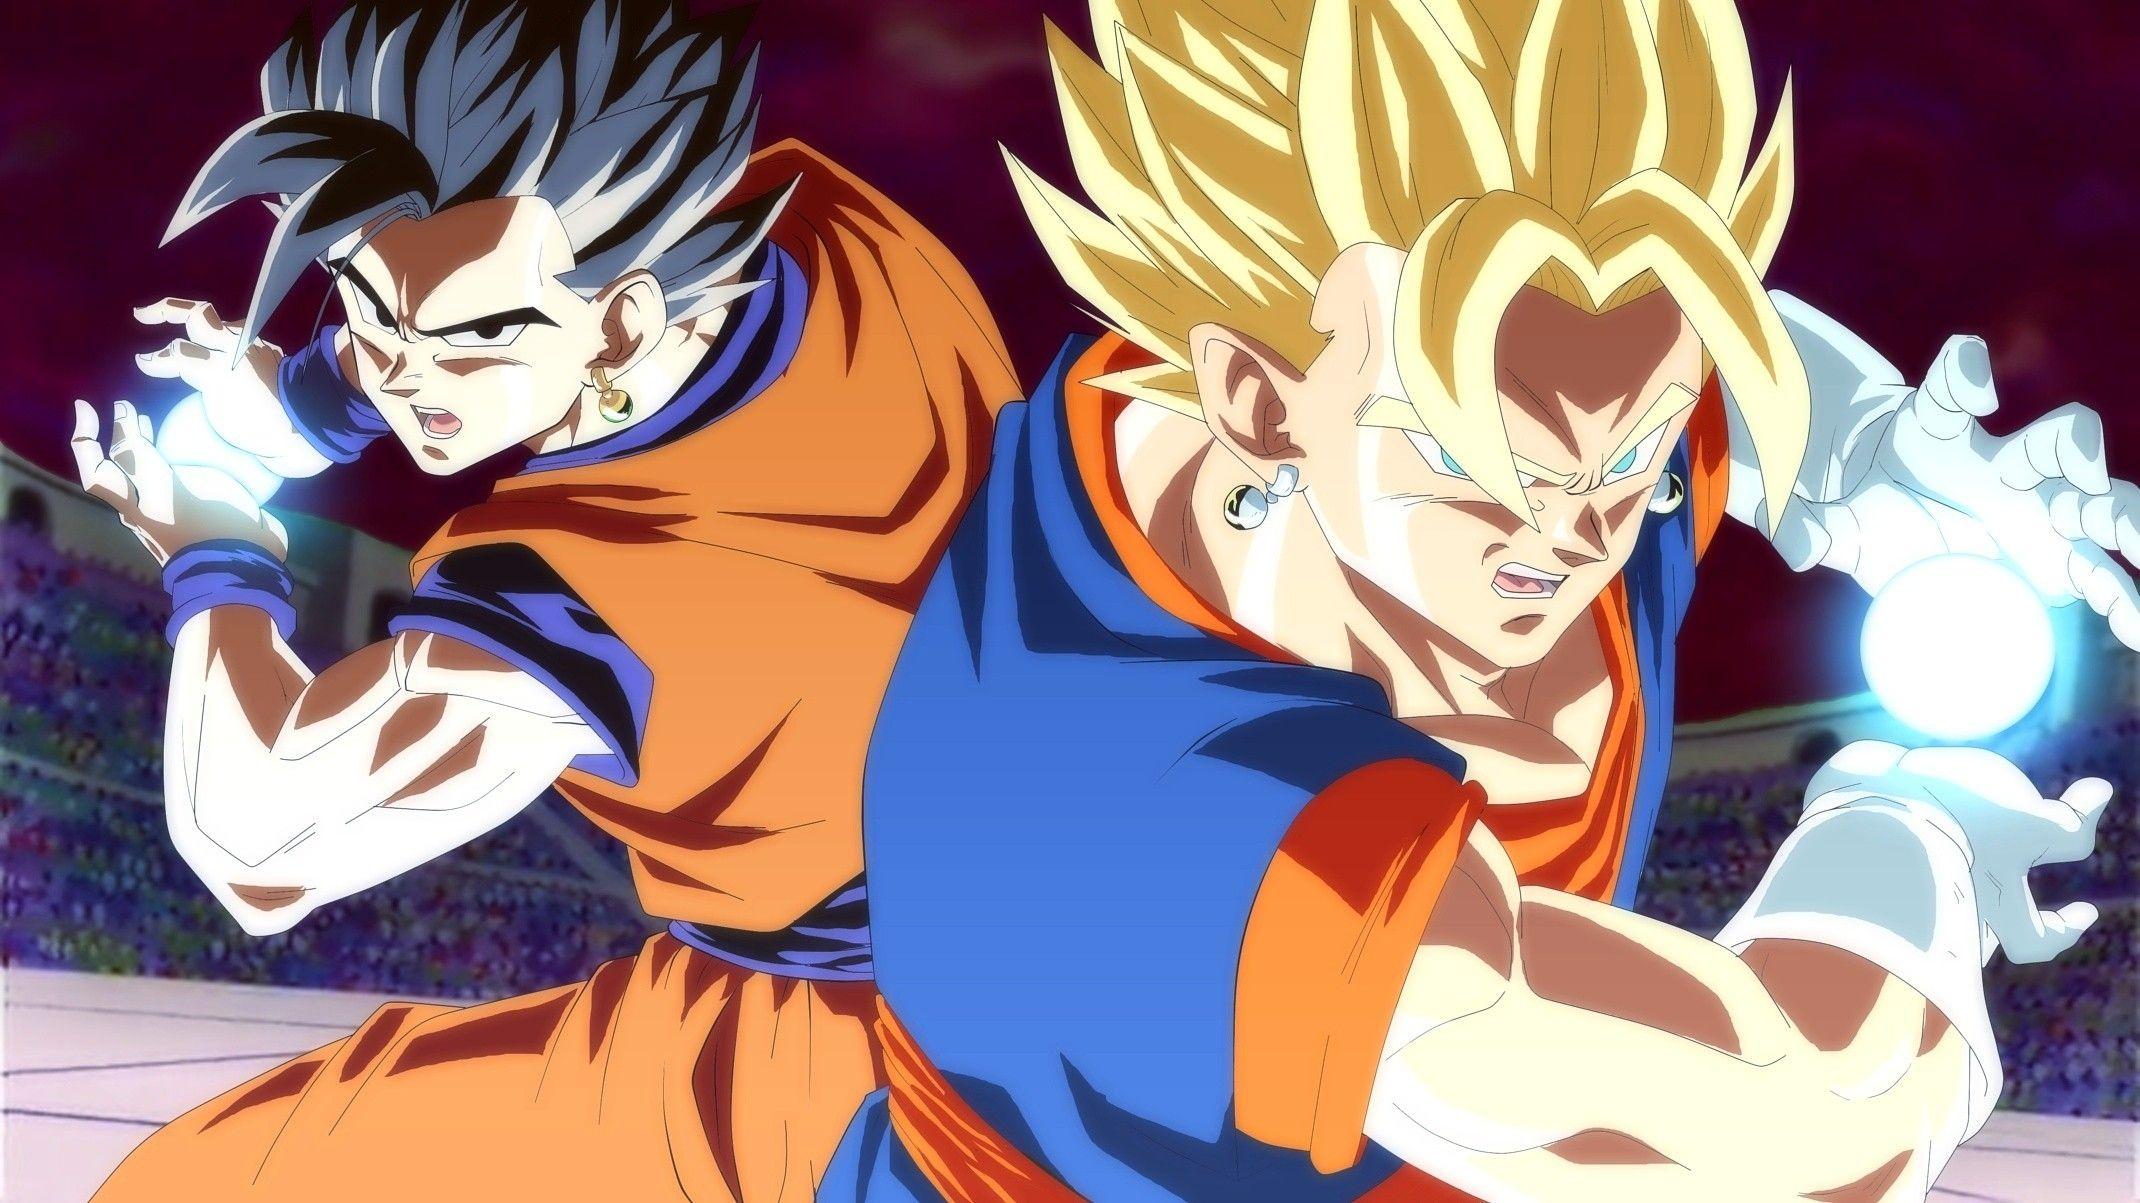 Goku Y Gohan Fusion Vegetto Ssj Anime Dragon Ball Super Dragon Ball Image Dragon Ball Z